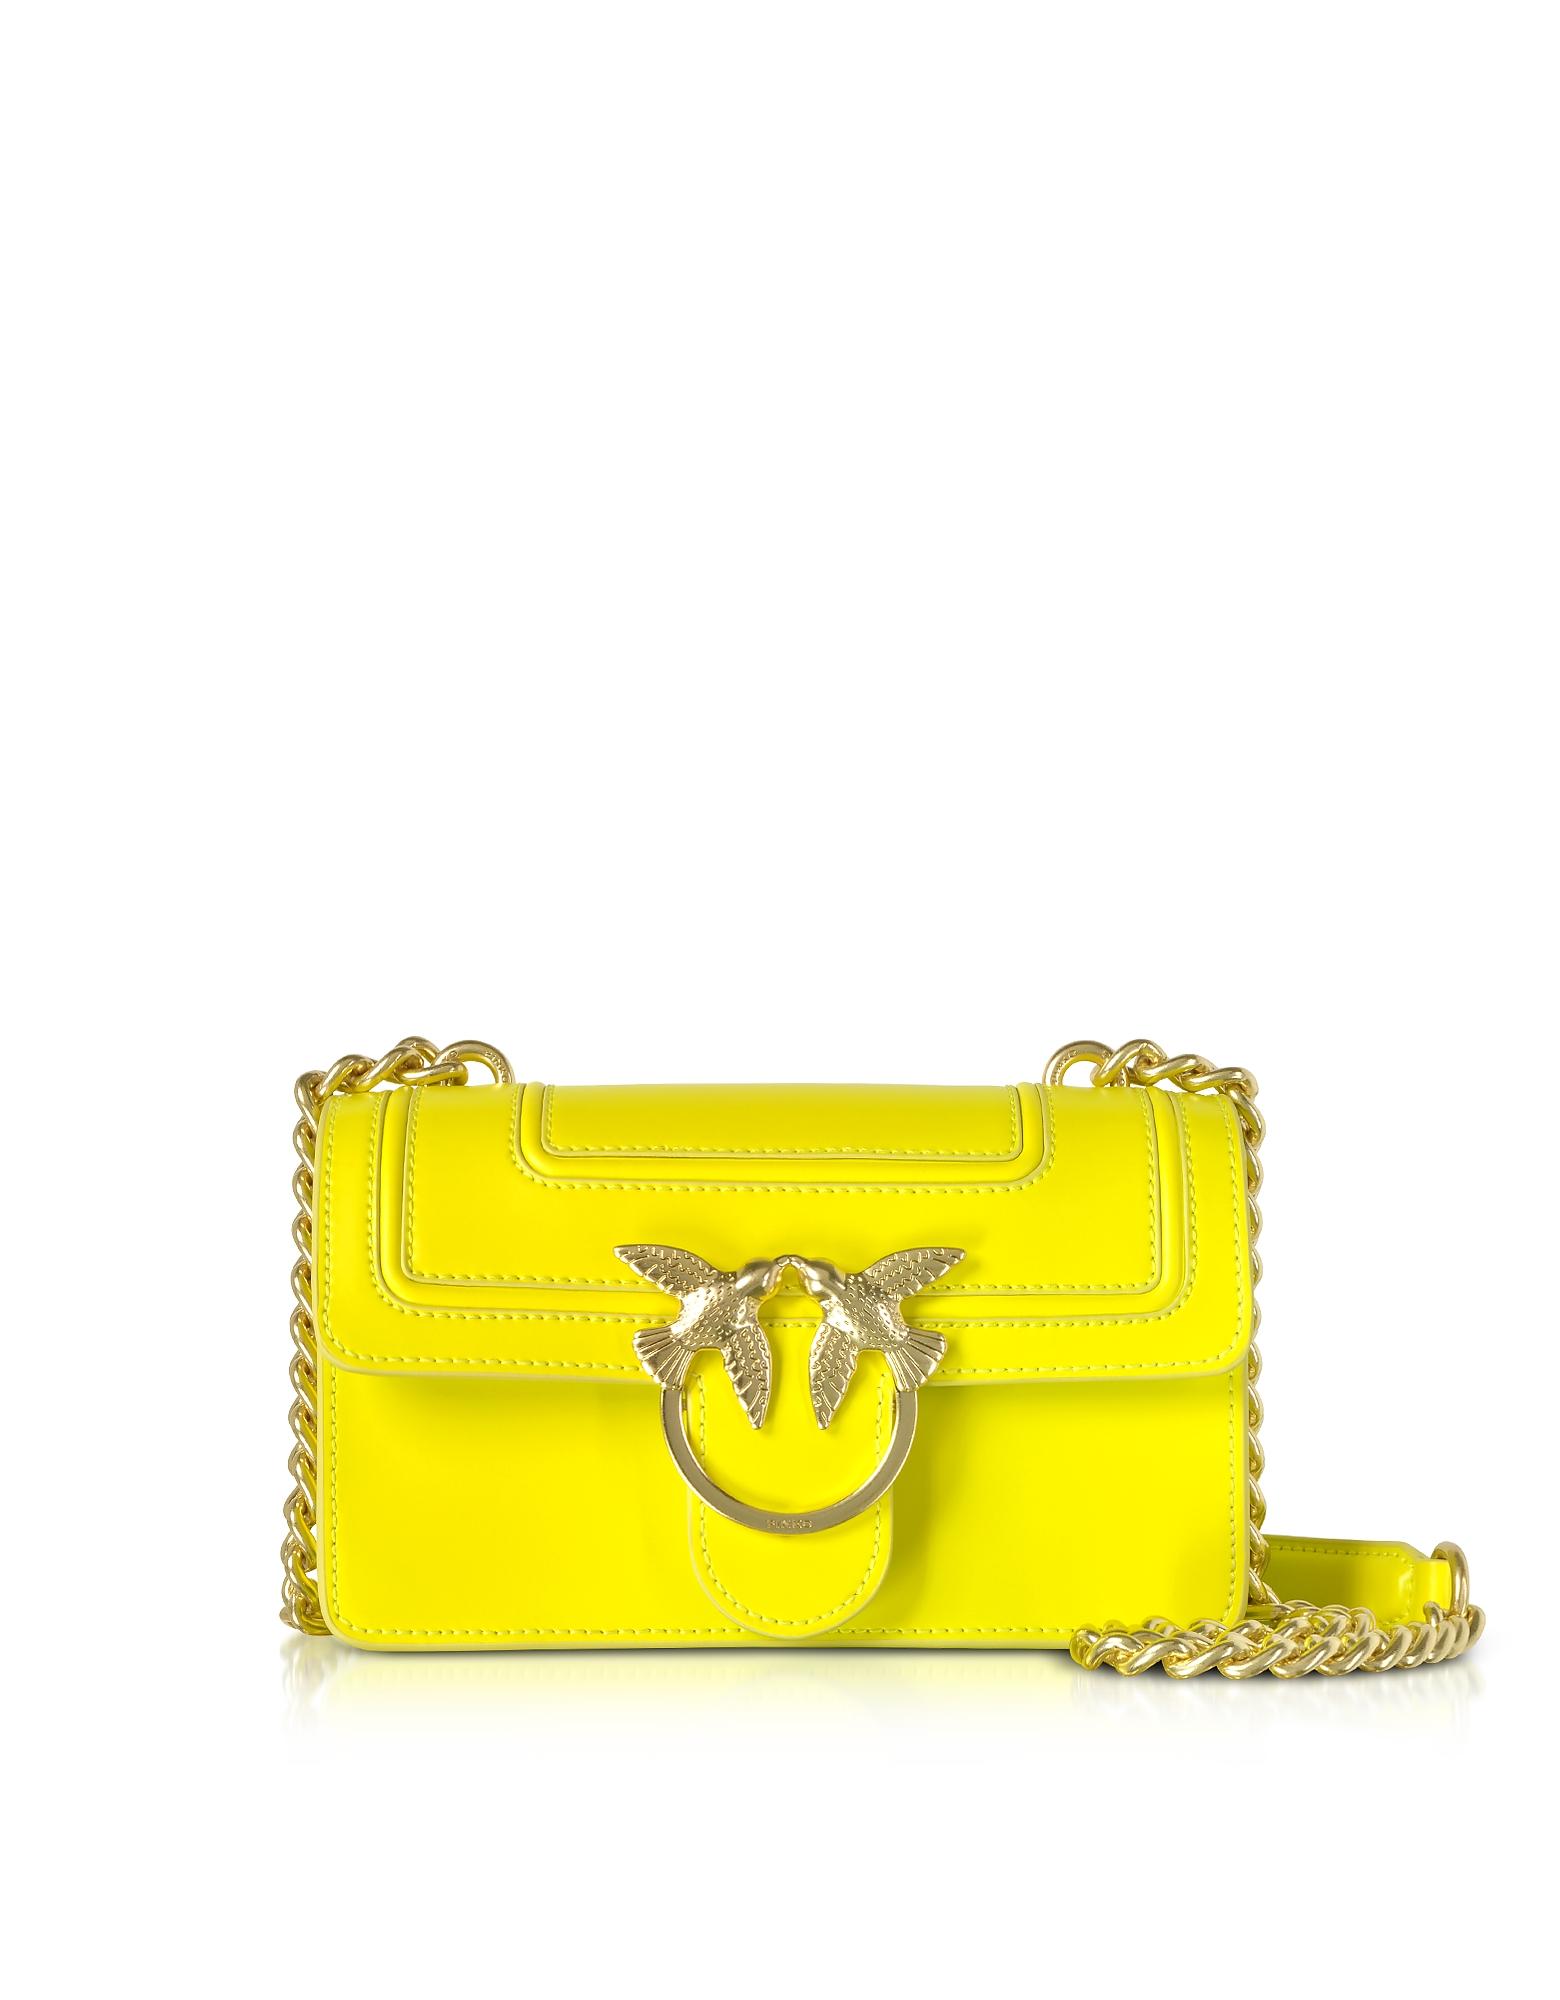 Pinko Handbags, Mini Love Fluo Leather Shoulder Bag